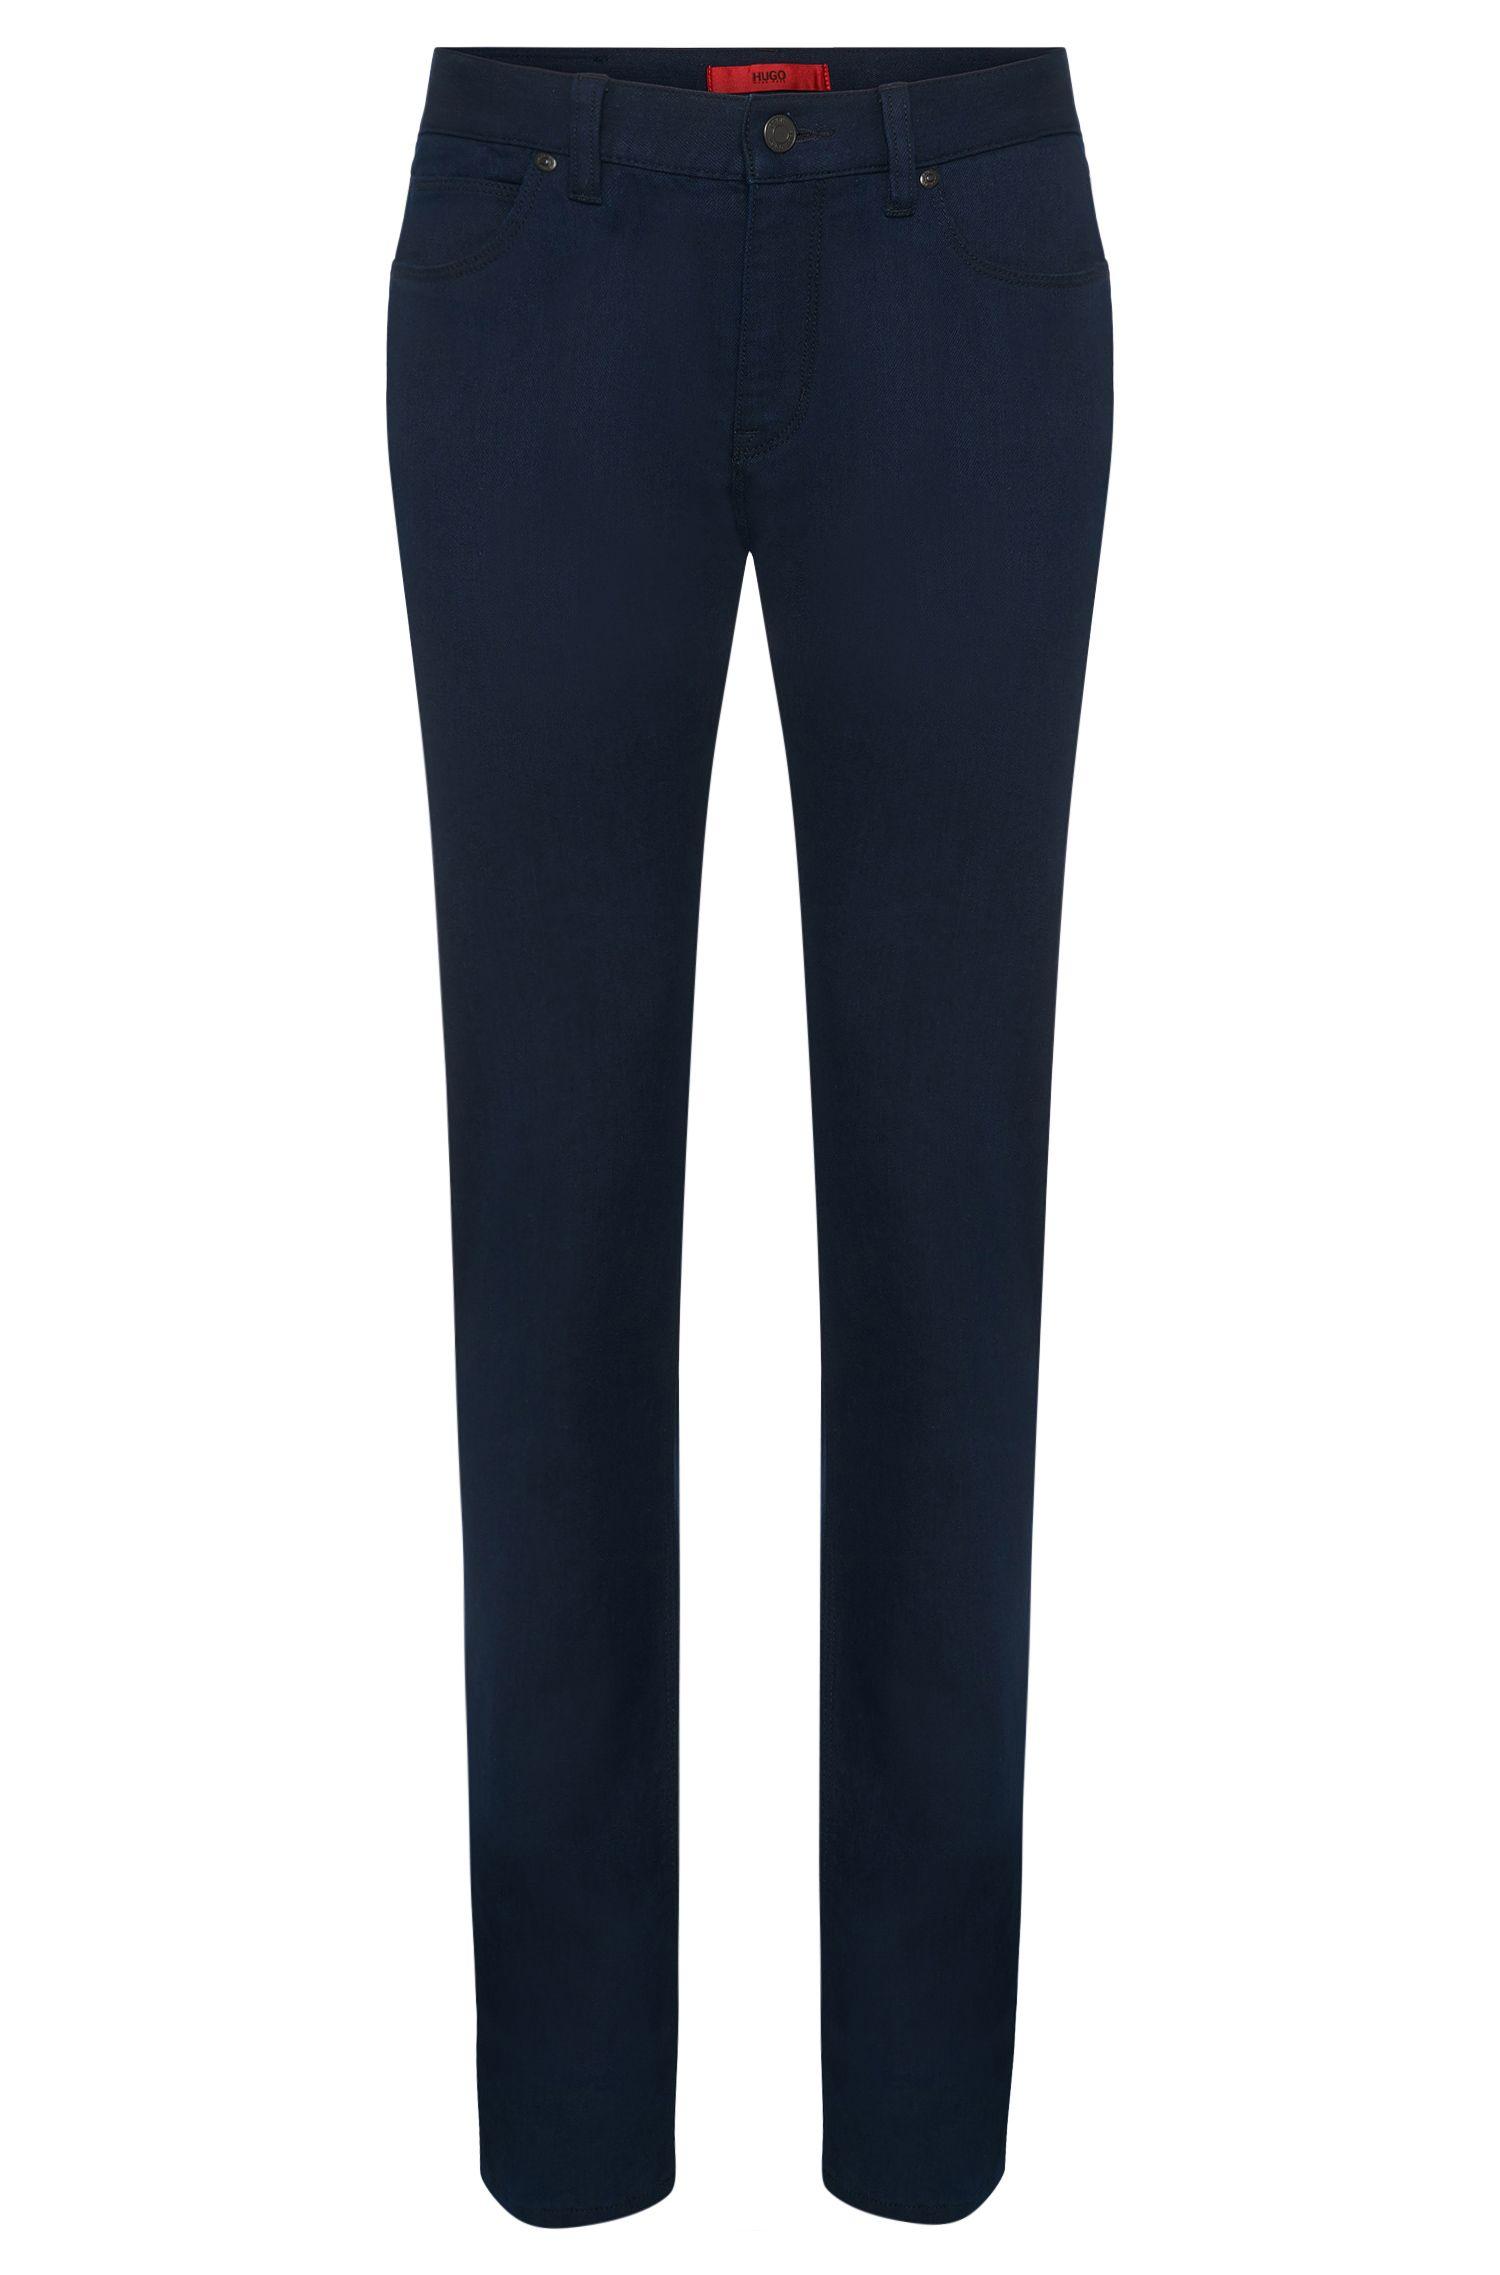 'HUGO 708' | Slim Fit, 11 oz Stretch Cotton Blend Jeans